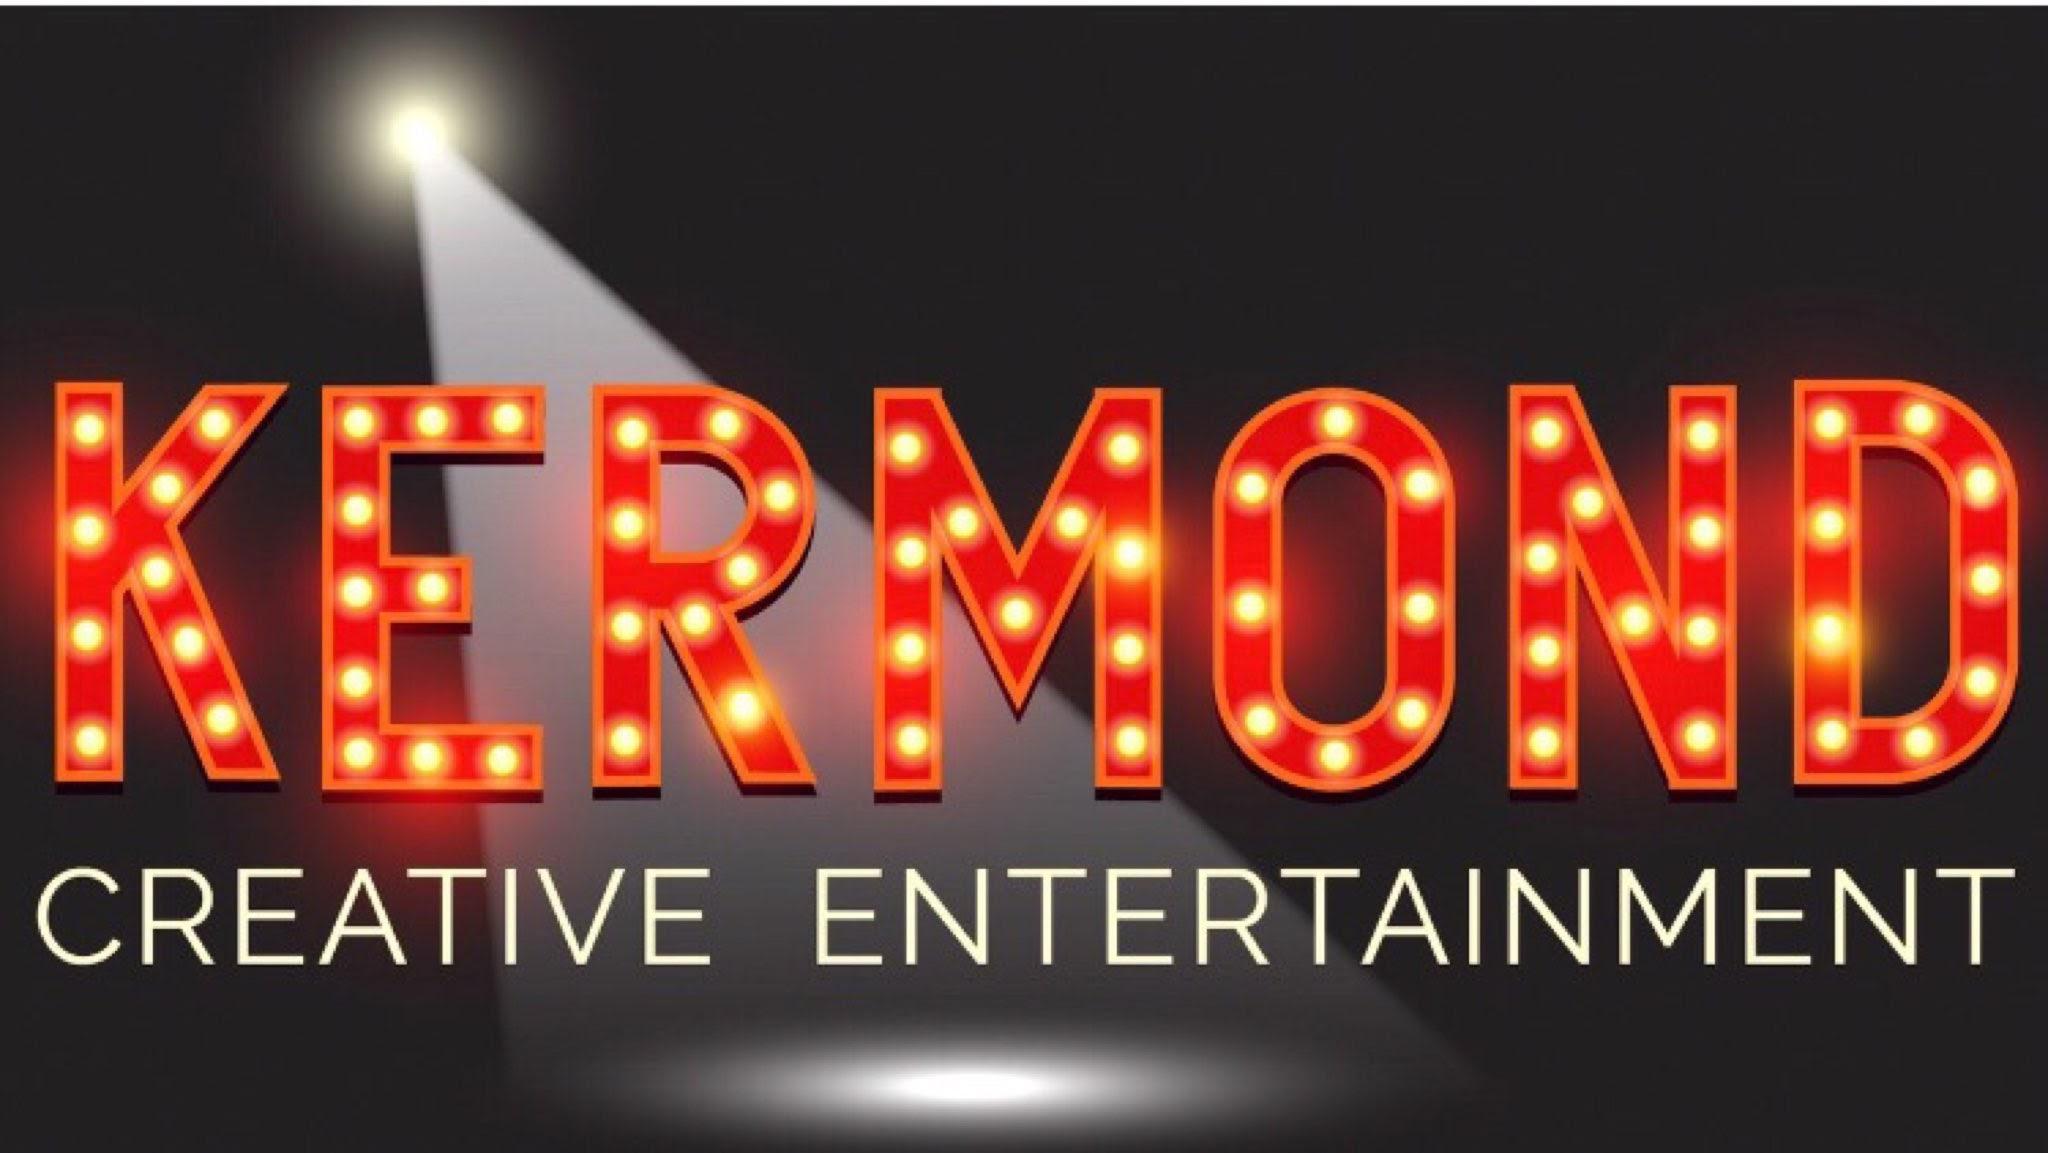 Kermond Creative Entertainment